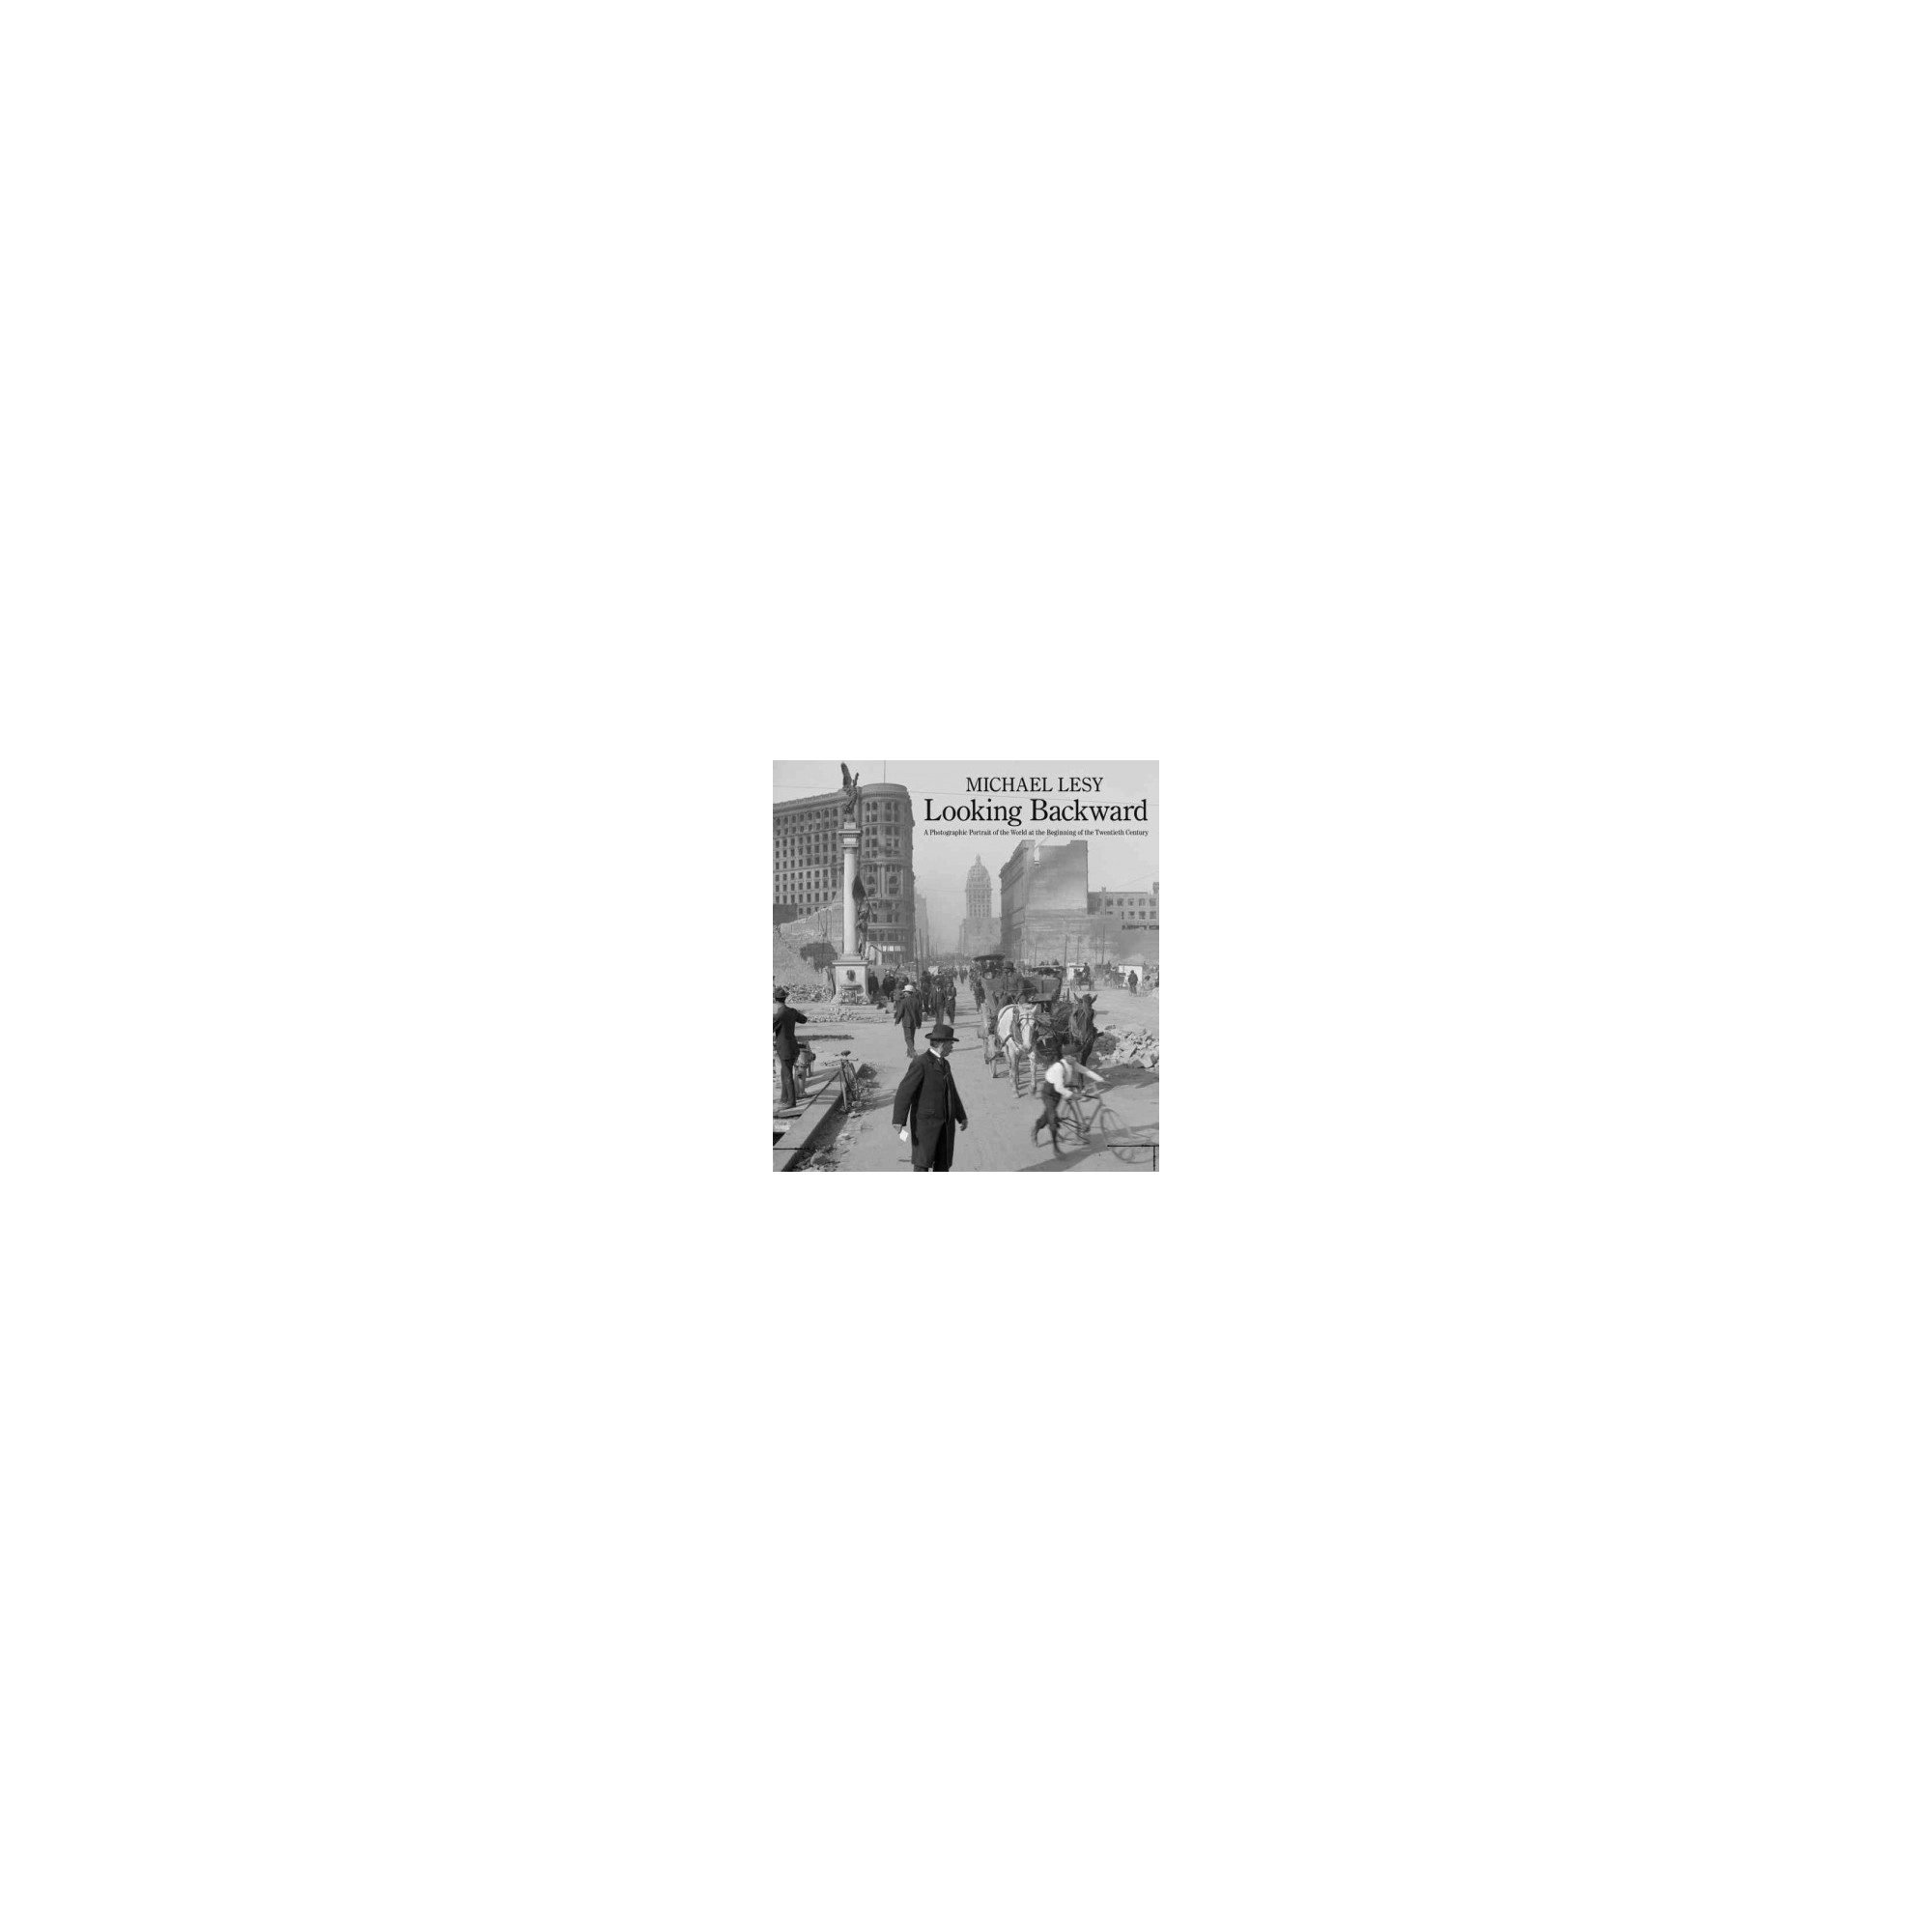 Arquitectura En Guadua Arq Oscar Hidalgo Lopez Kaos Welder Welding 3dimensi Looking Backward A Photographic Portrait Of The World At Beginning Twentieth Century